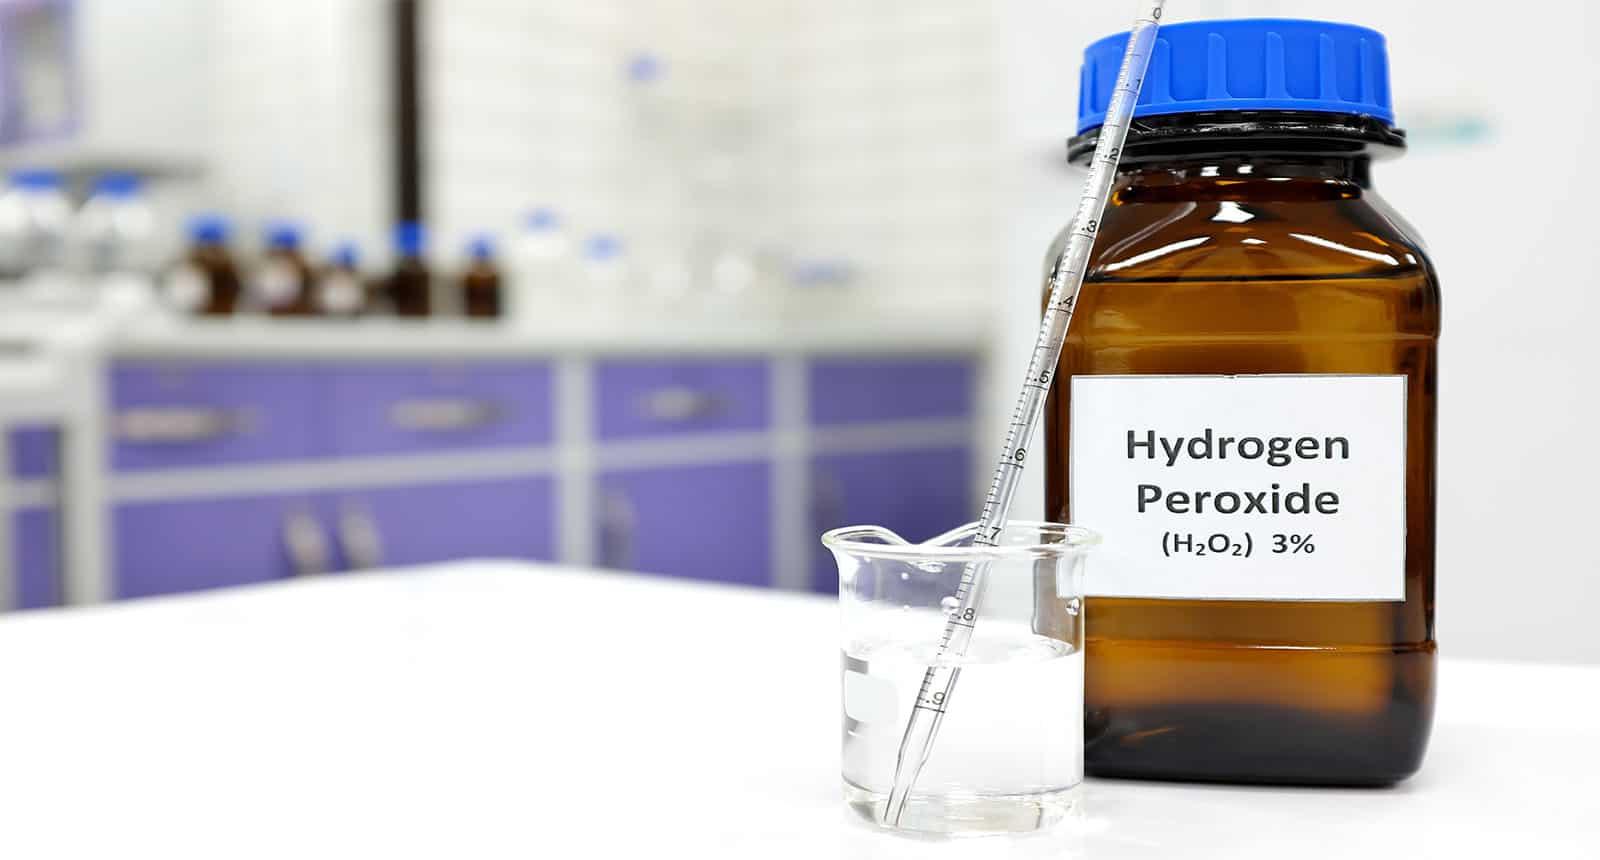 Focus Hydrogen Peroxide Solution